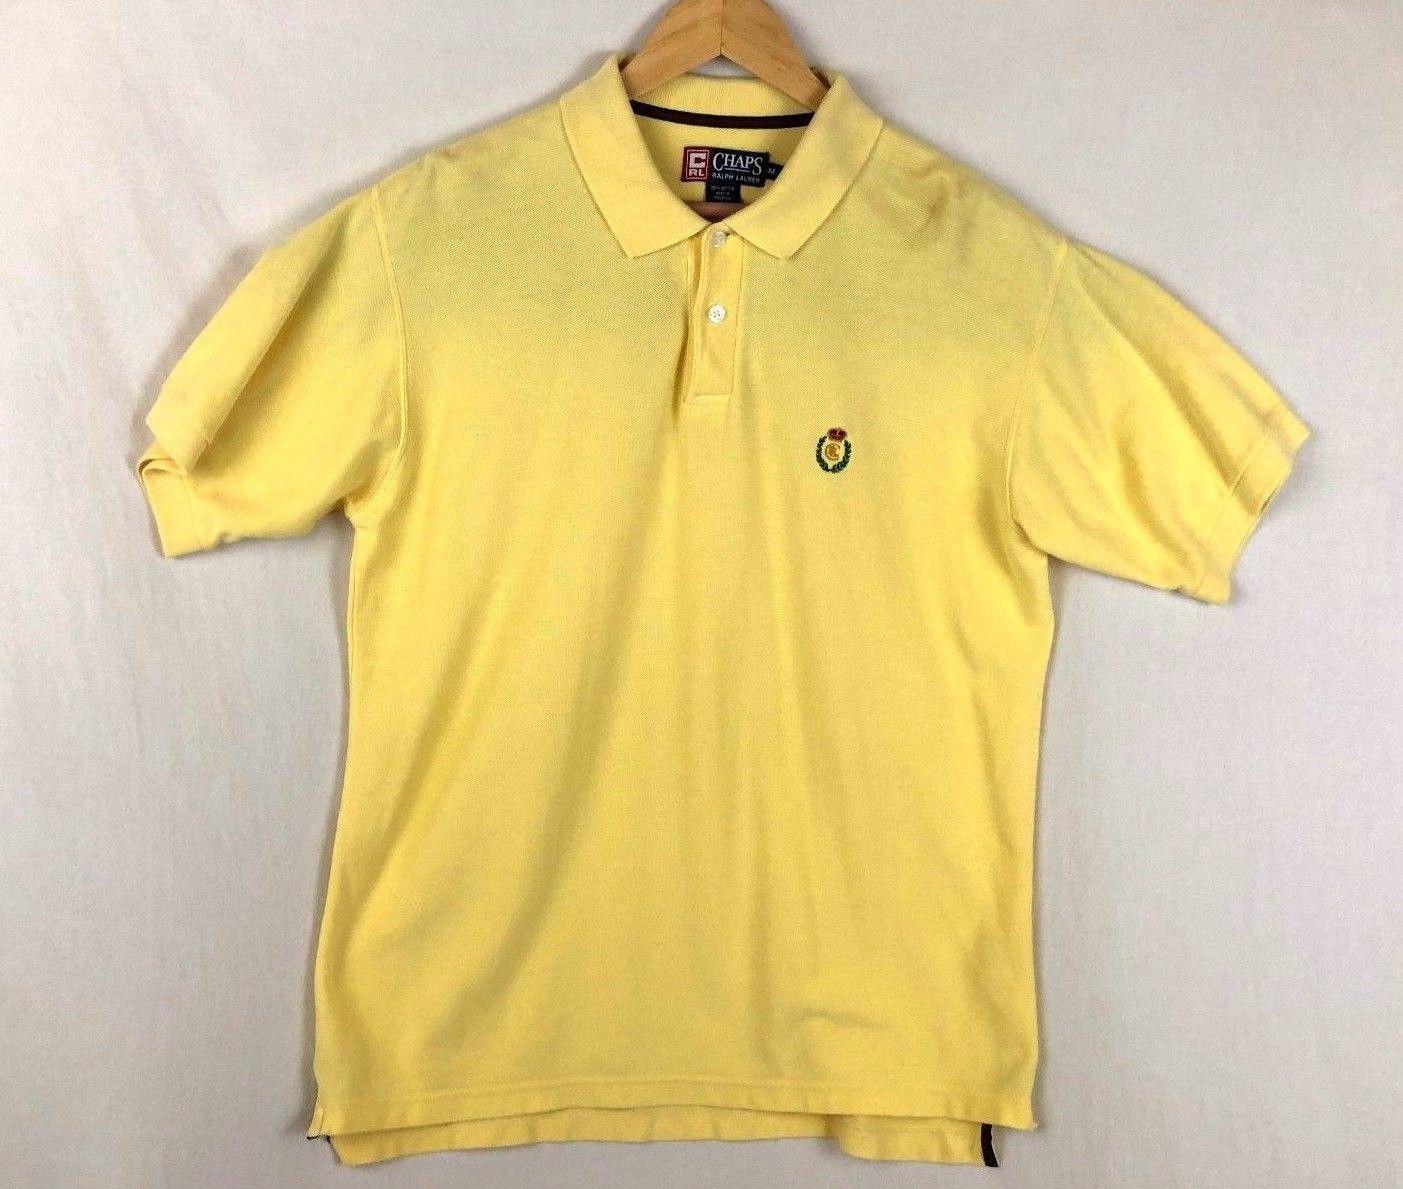 8f60ab335 S l1600. S l1600. Previous. Vintage Chaps Ralph Lauren Mens Yellow Size  Medium Short Sleeve Polo Shirt